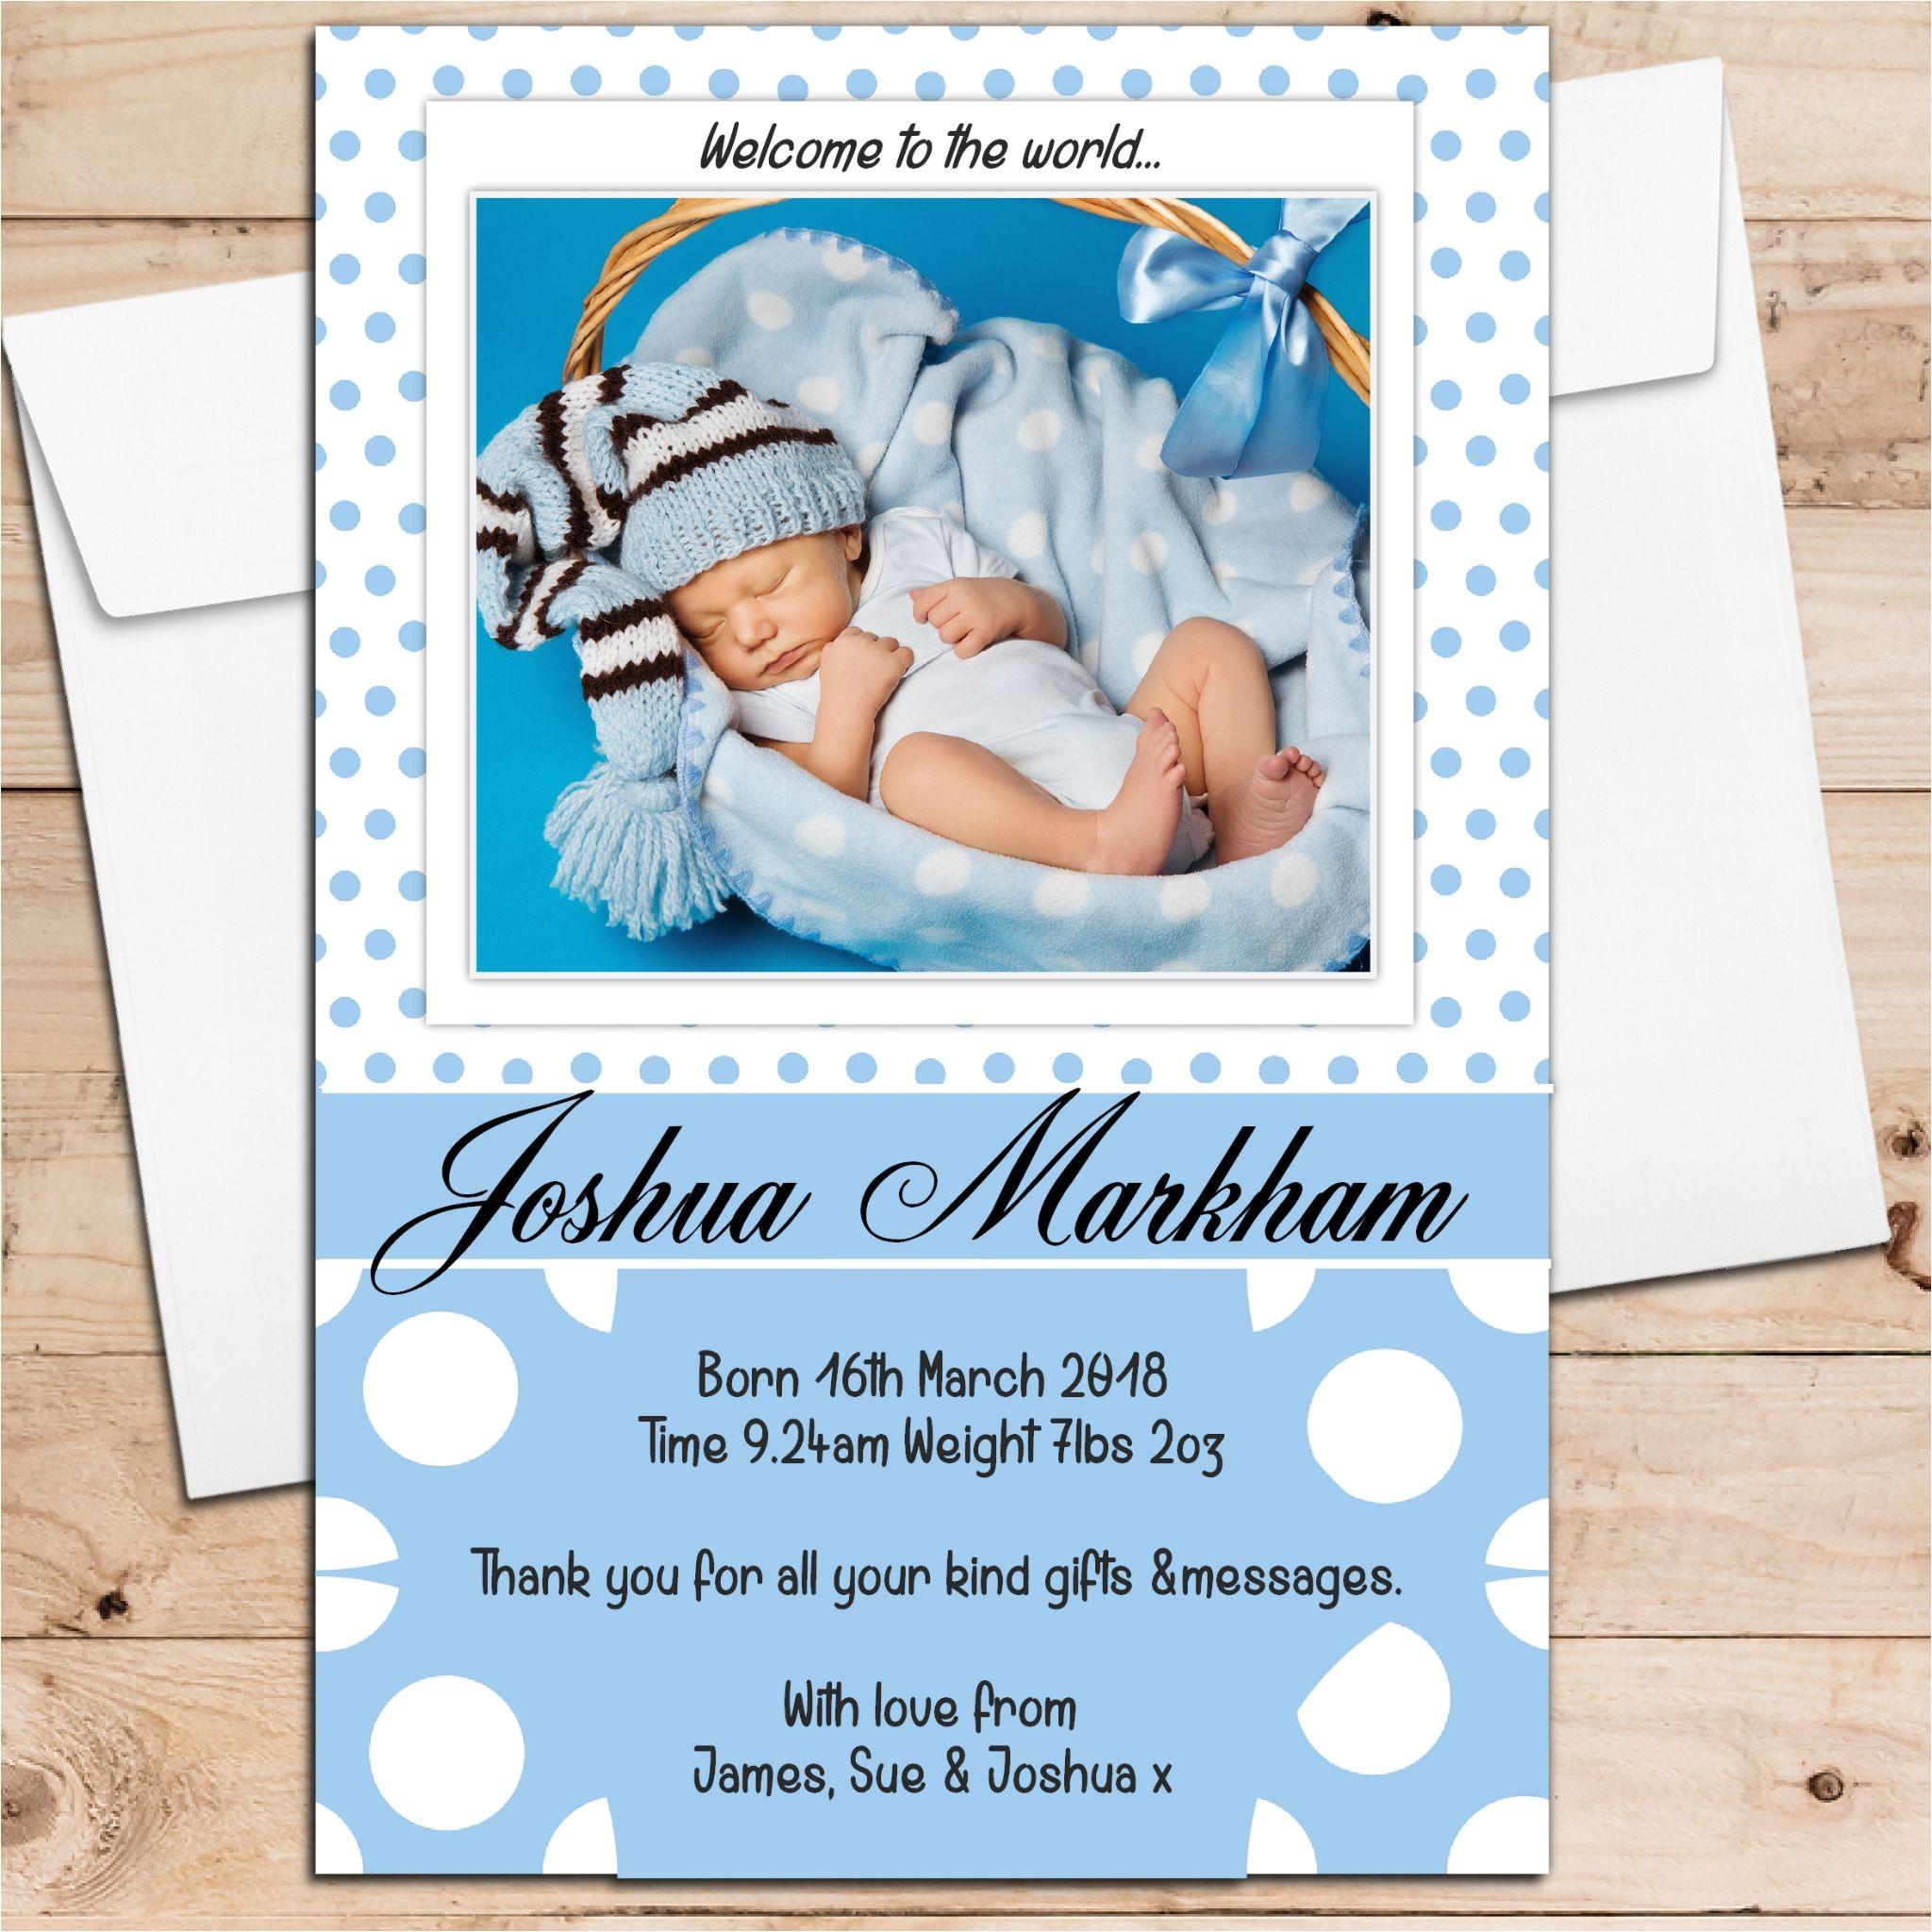 Baby Birth Party Invitation Card Birth Announcement Cards Baby Announcement Cards